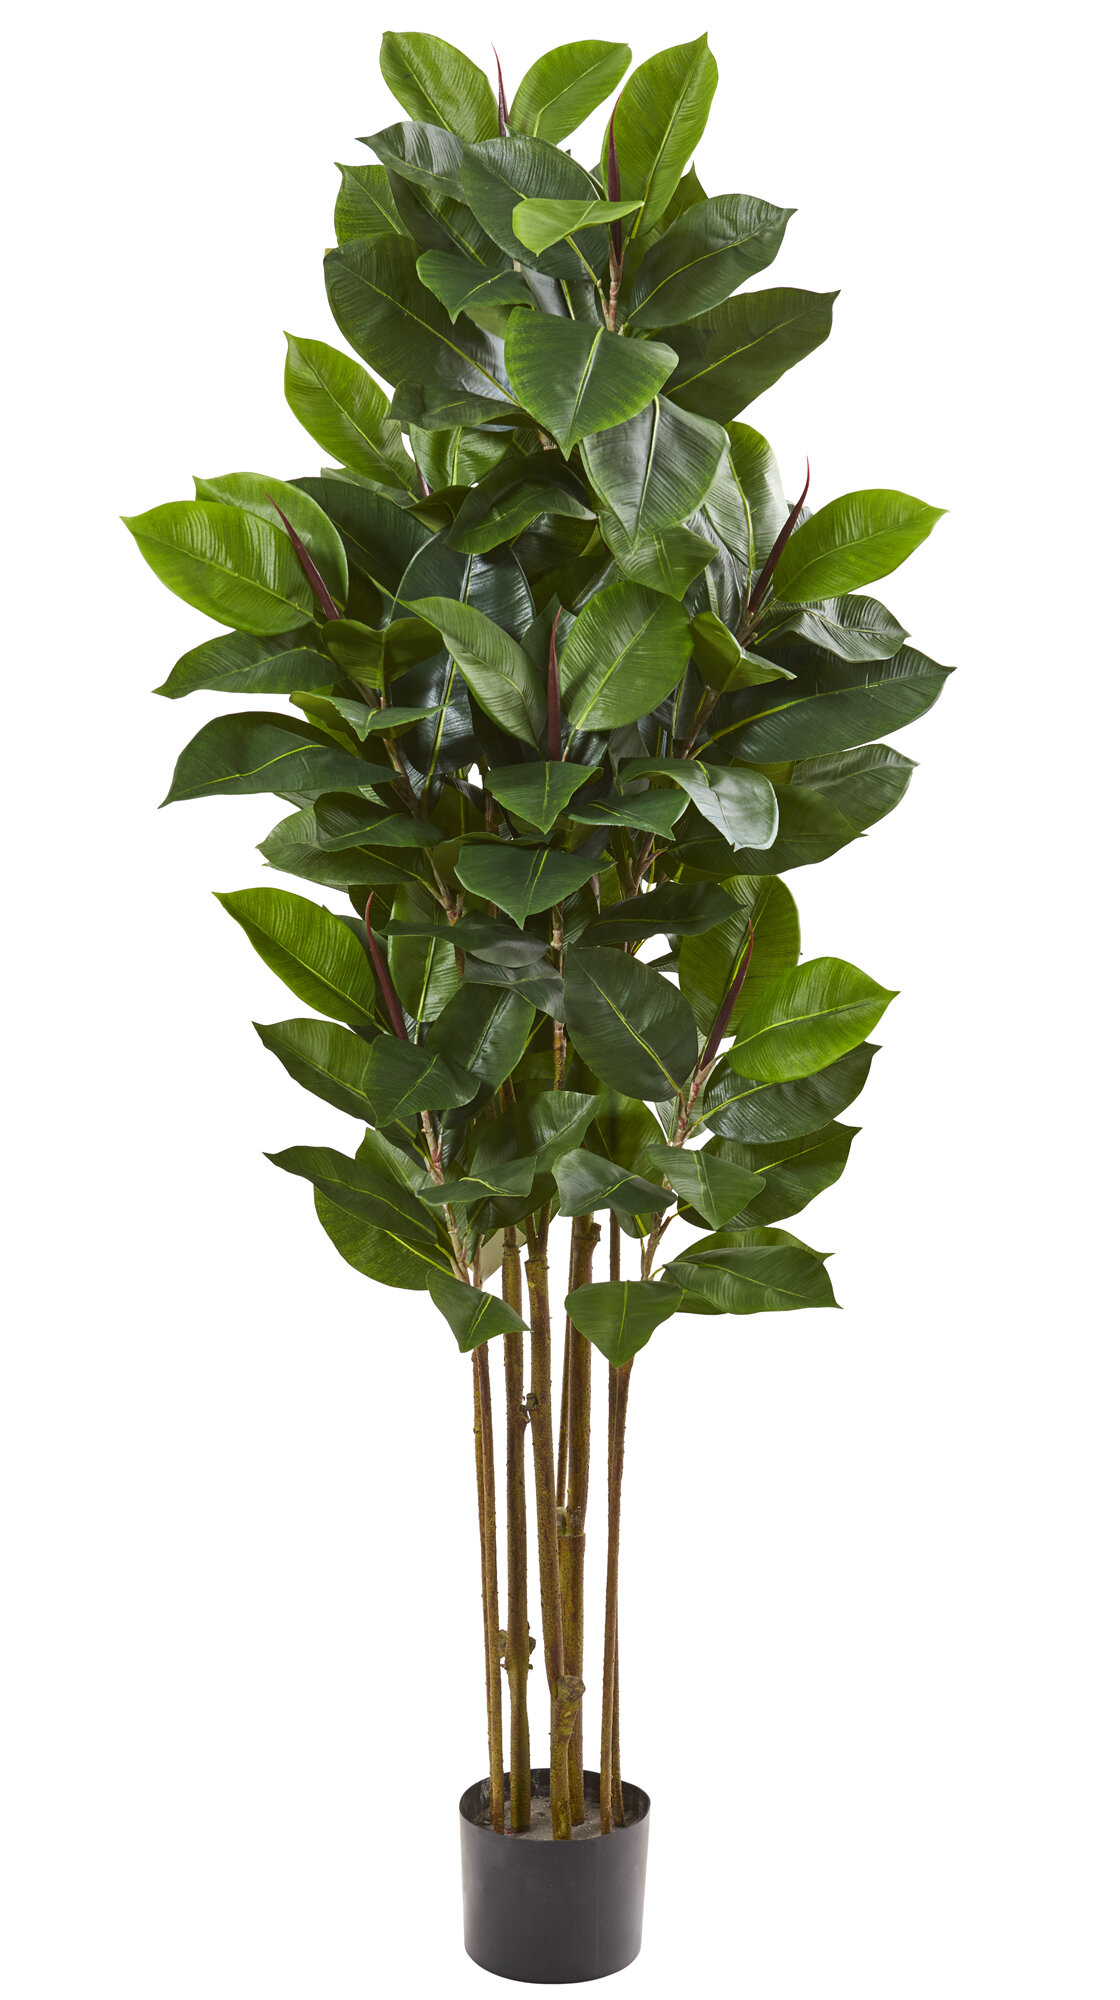 Primrue Artificial Rubber Leaf Tree In Pot Liner Reviews Wayfair